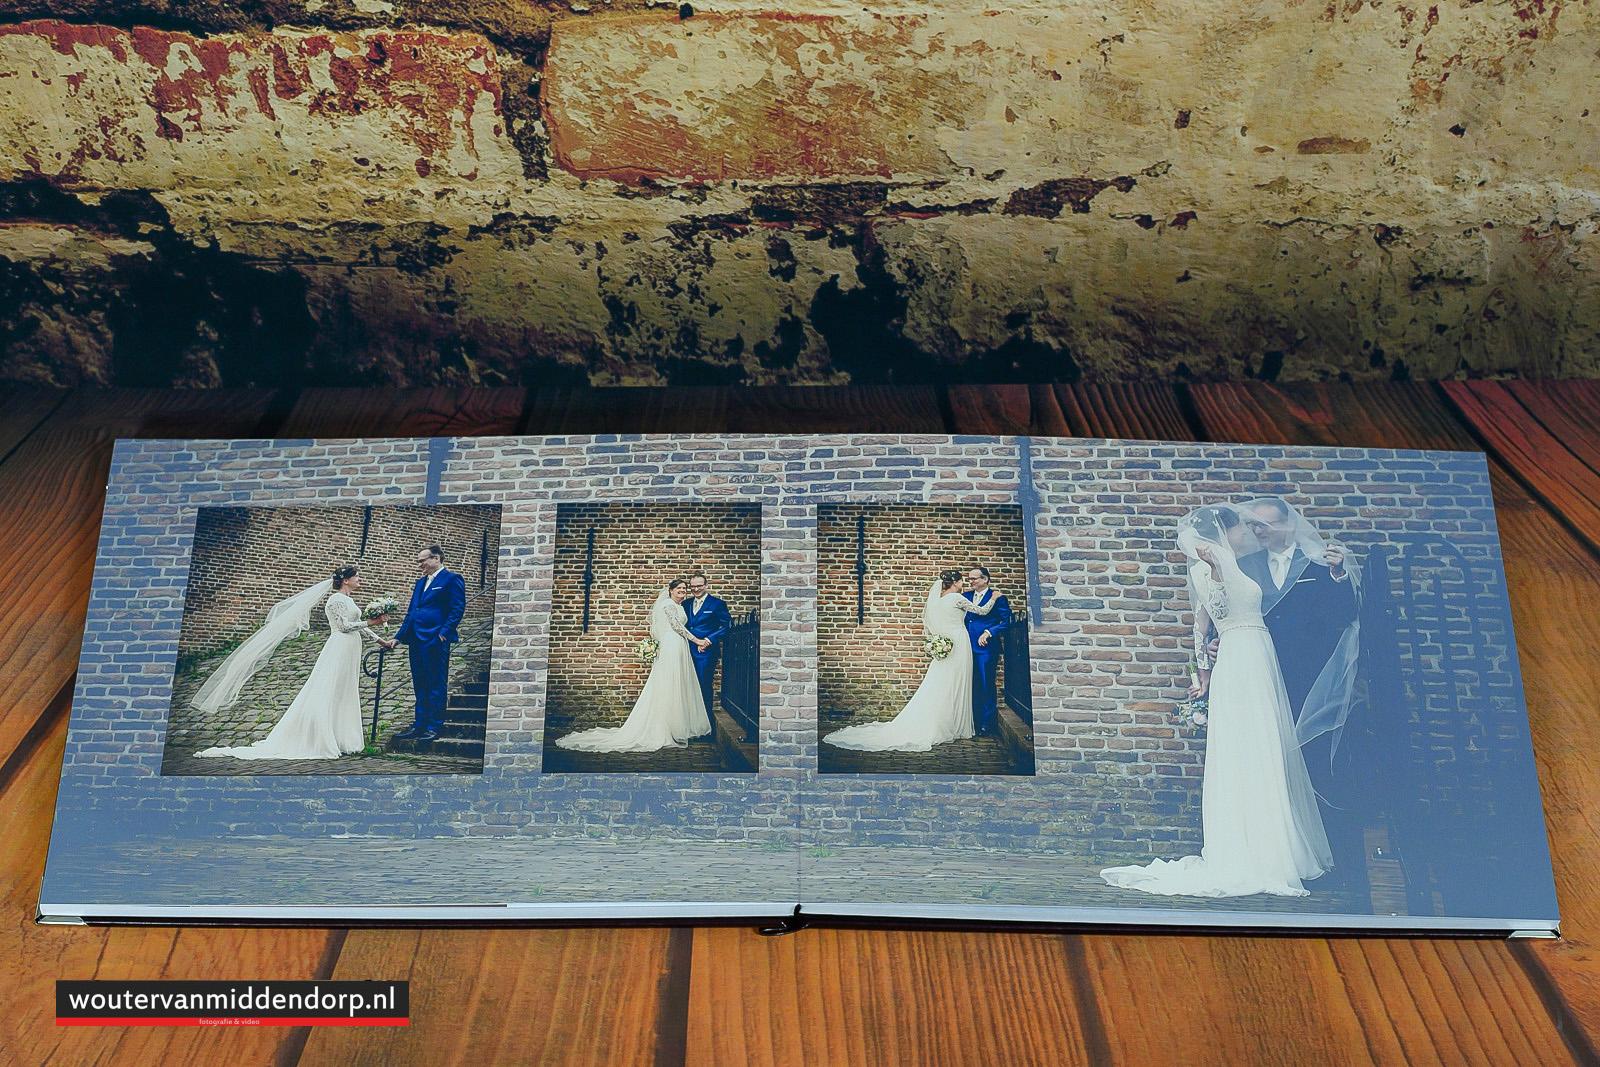 trouwalbum, bruidsreportage, trouwfotograaf, groepsfoto, fotograaf, Wouter van Middendorp, Veluwe, Uddel, Lunteren, (5)